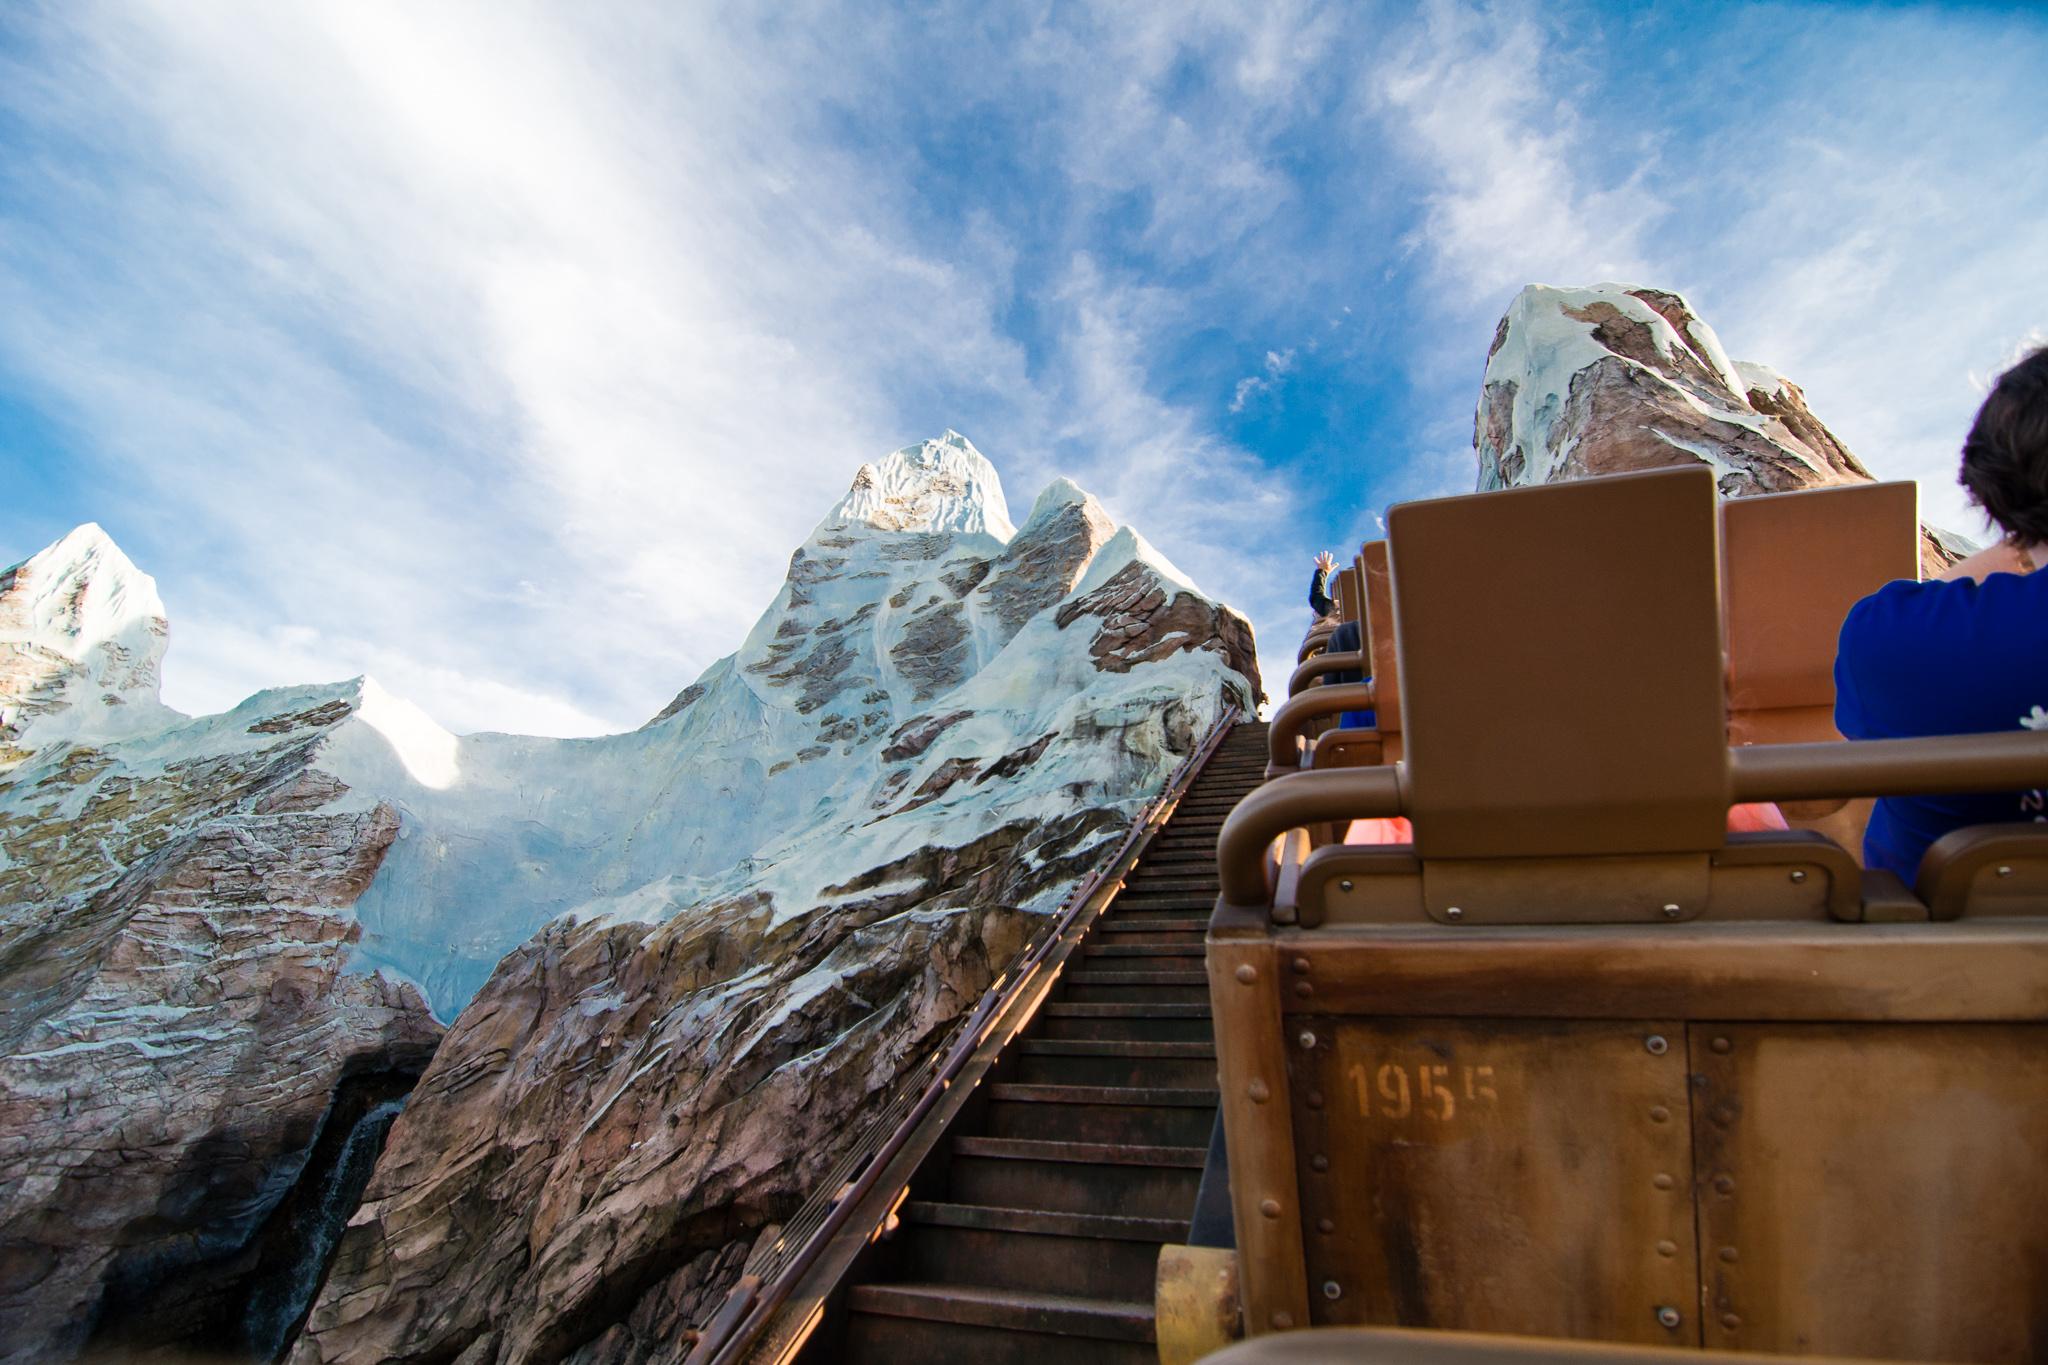 Expedition Everest at Disney's Animal Kingdom - UP!